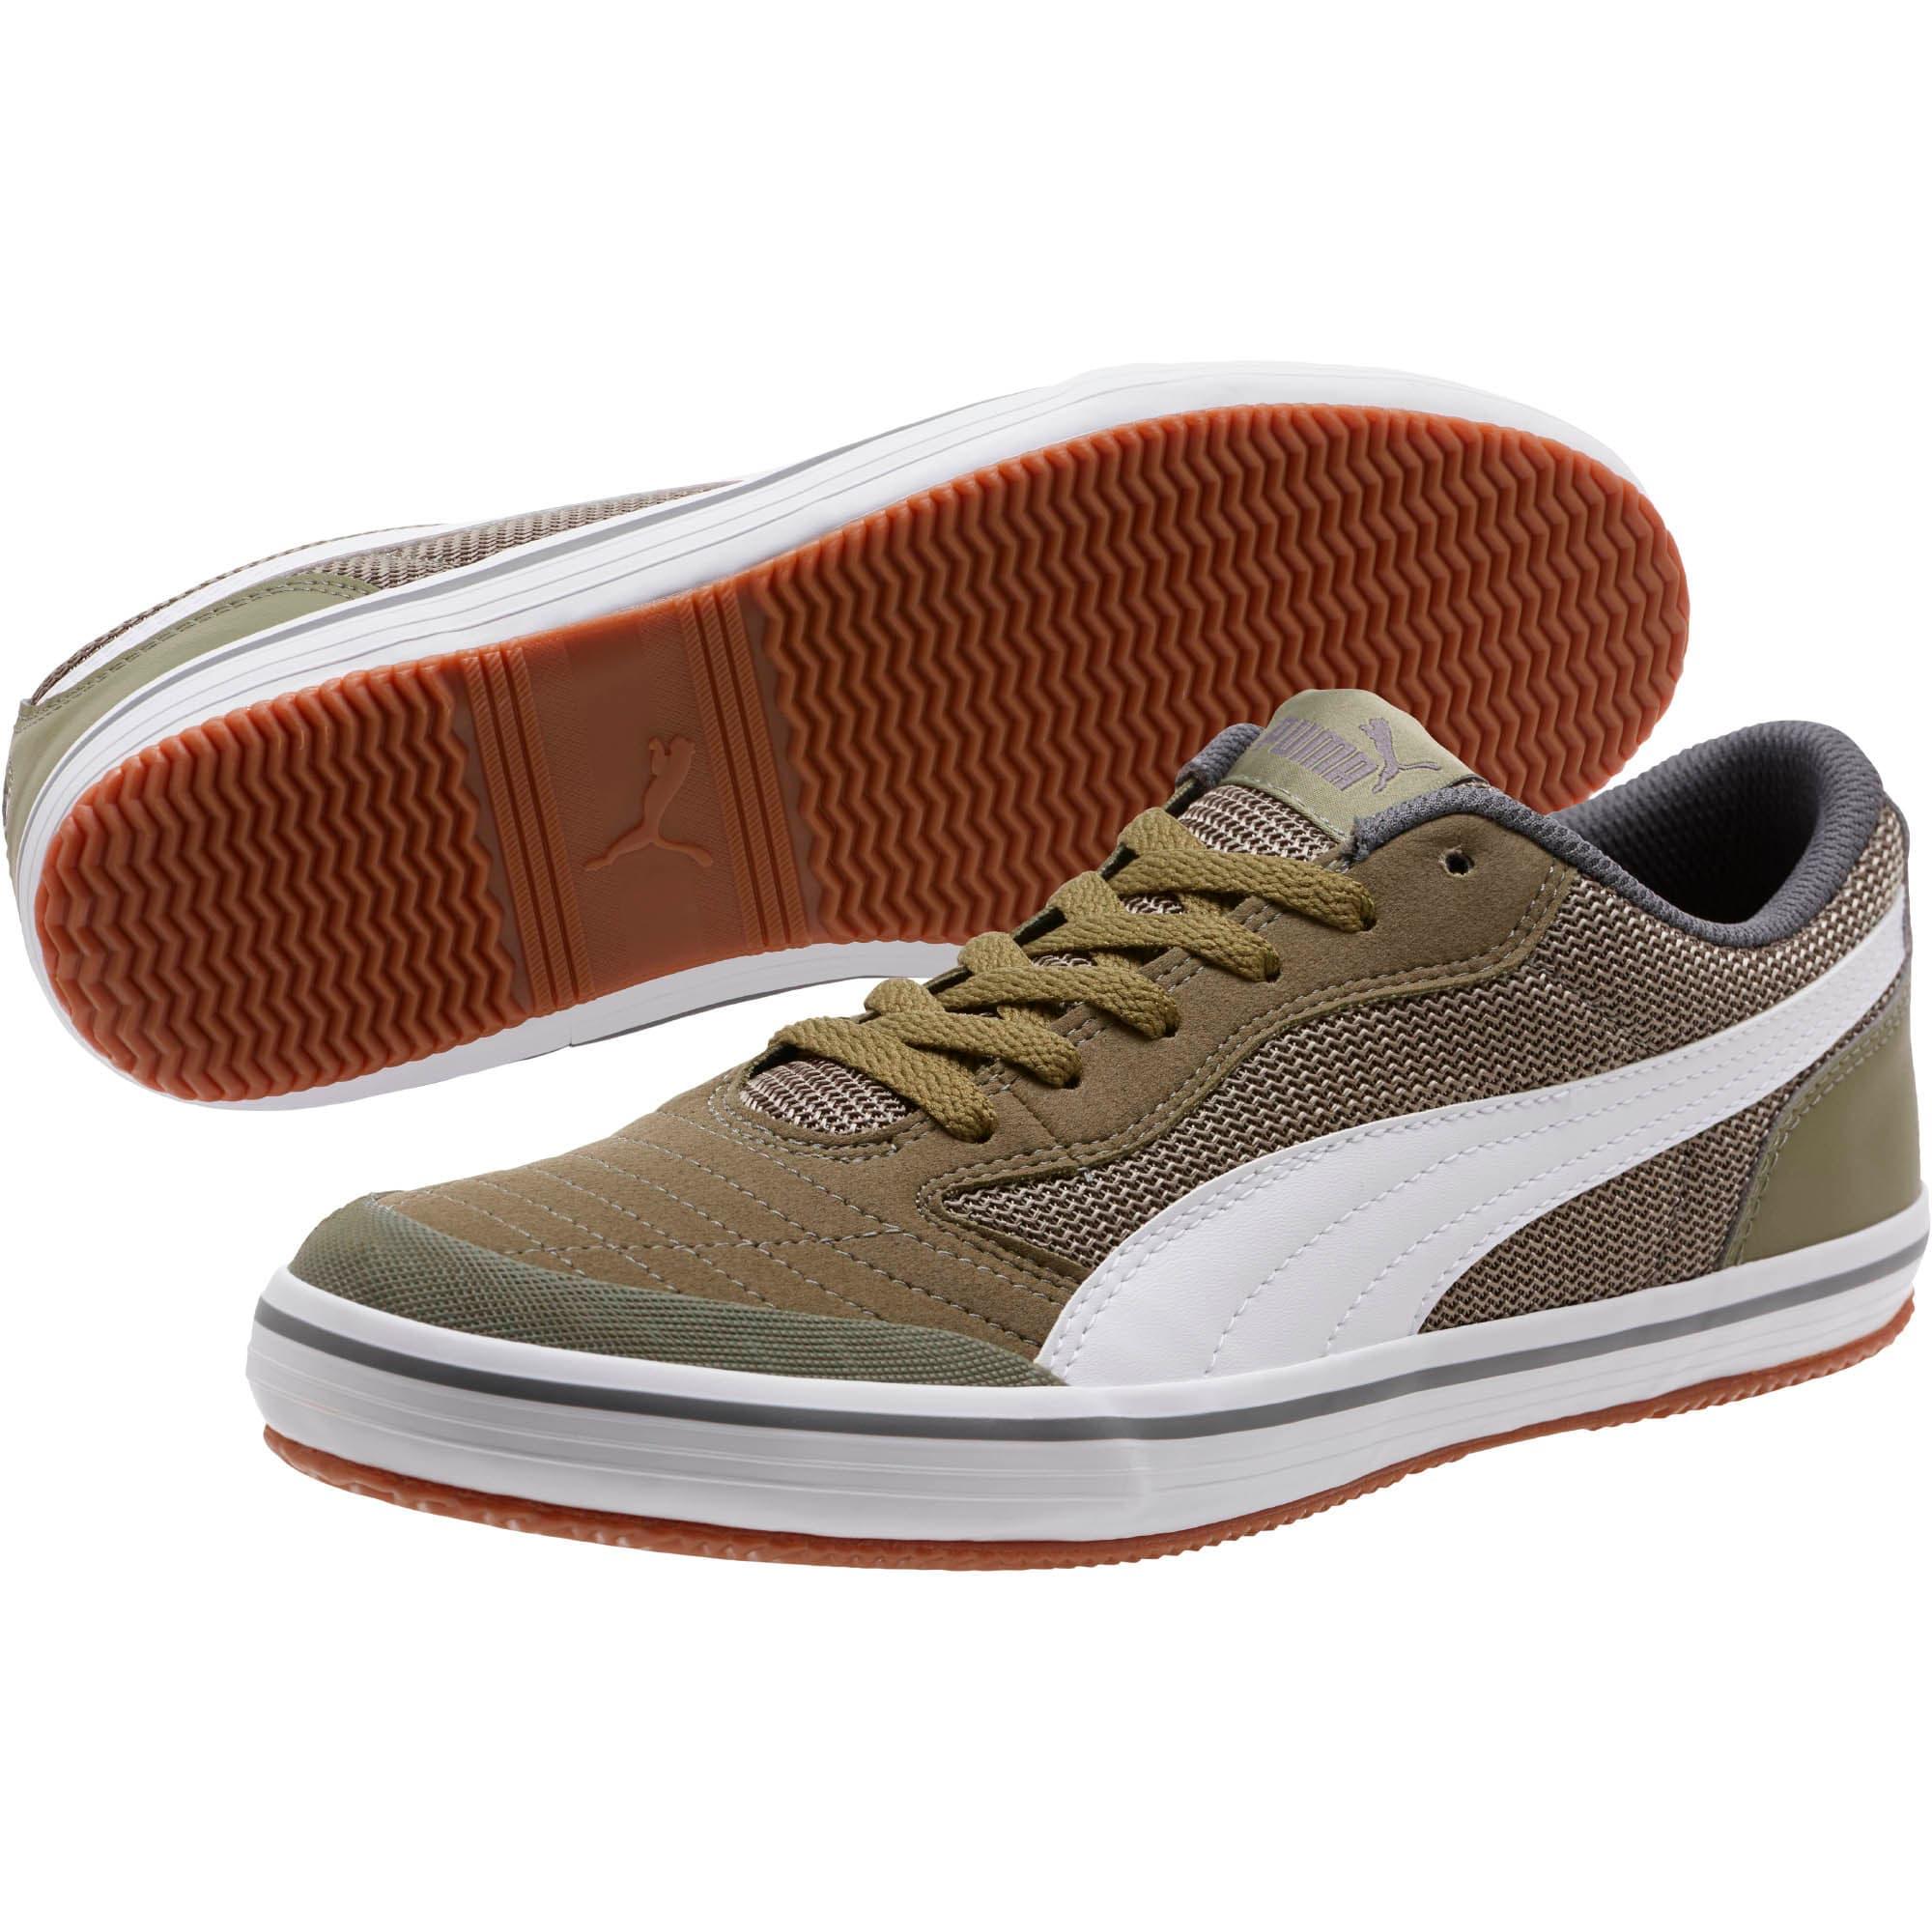 Thumbnail 2 of Astro Sala Sneakers, Burnt Olive-Puma White, medium